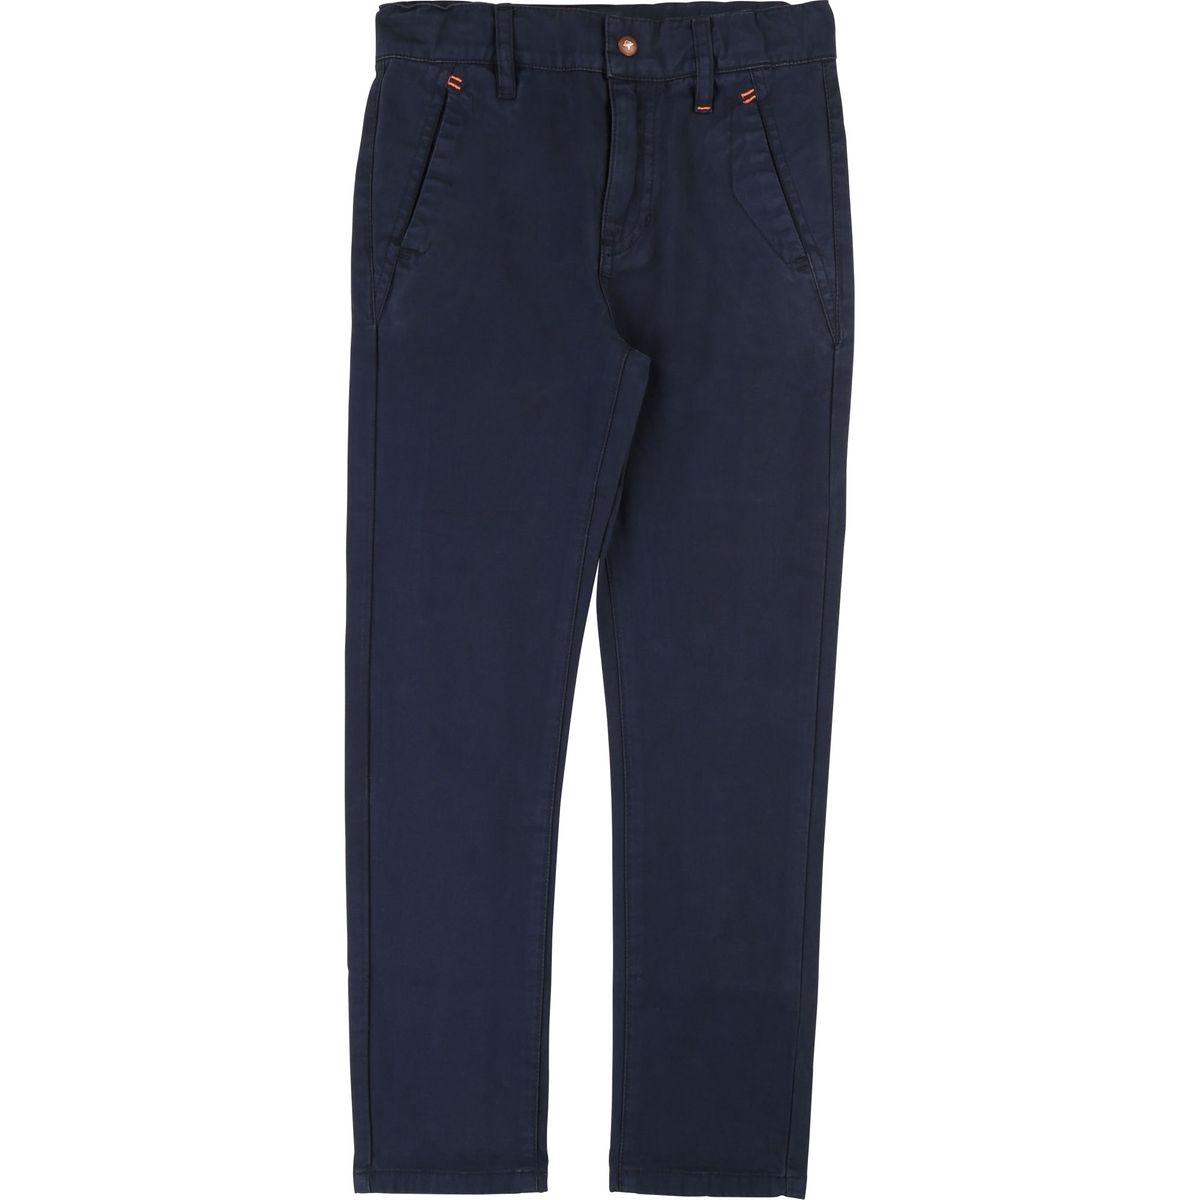 Pantalon chino uni 4 poches